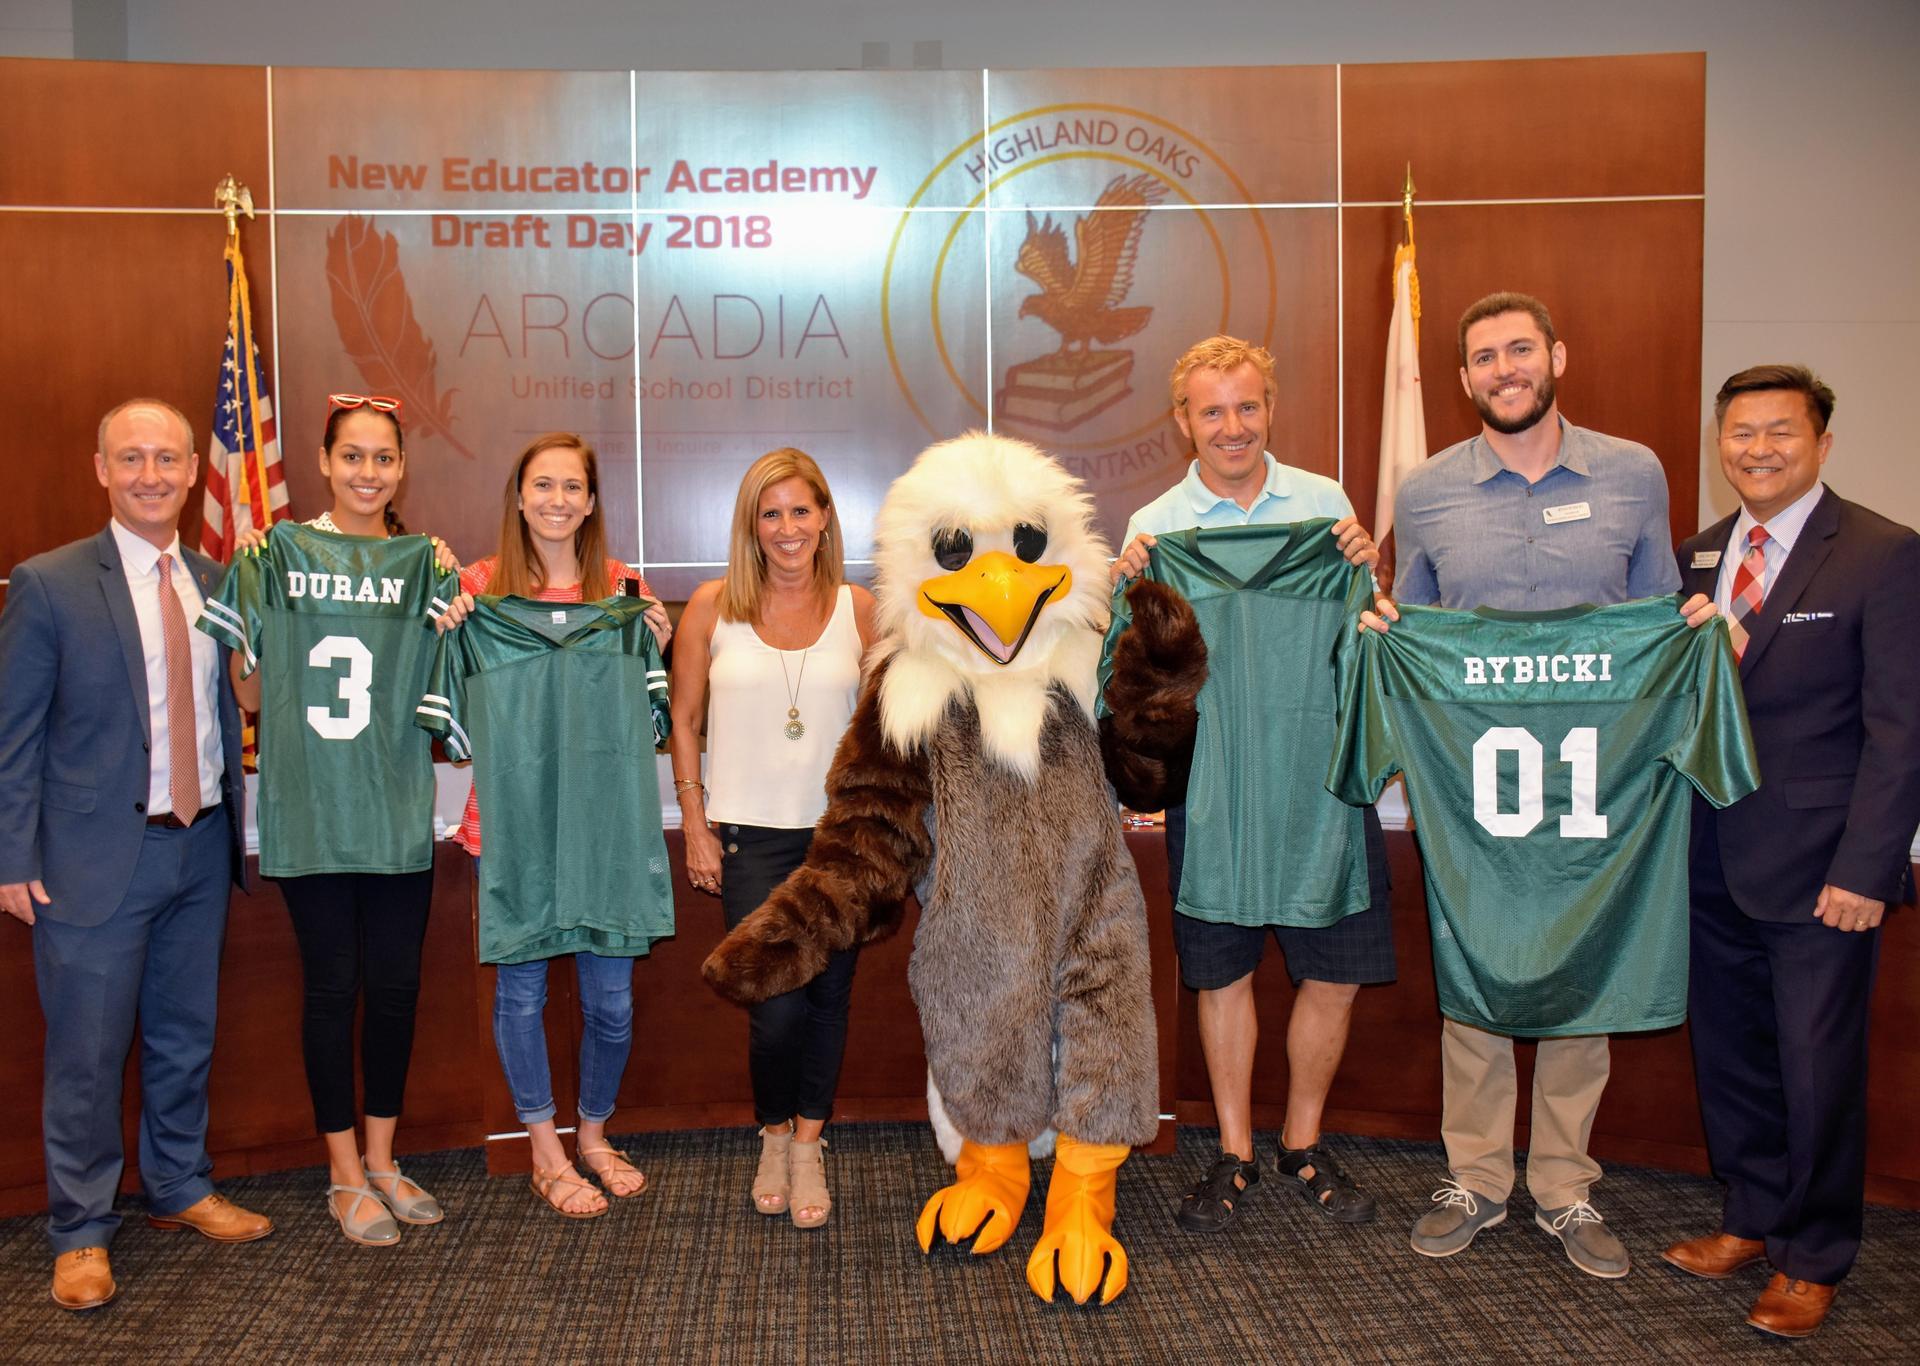 Highland Oaks Elementary Team from New Educator Academy Draft Day 2018